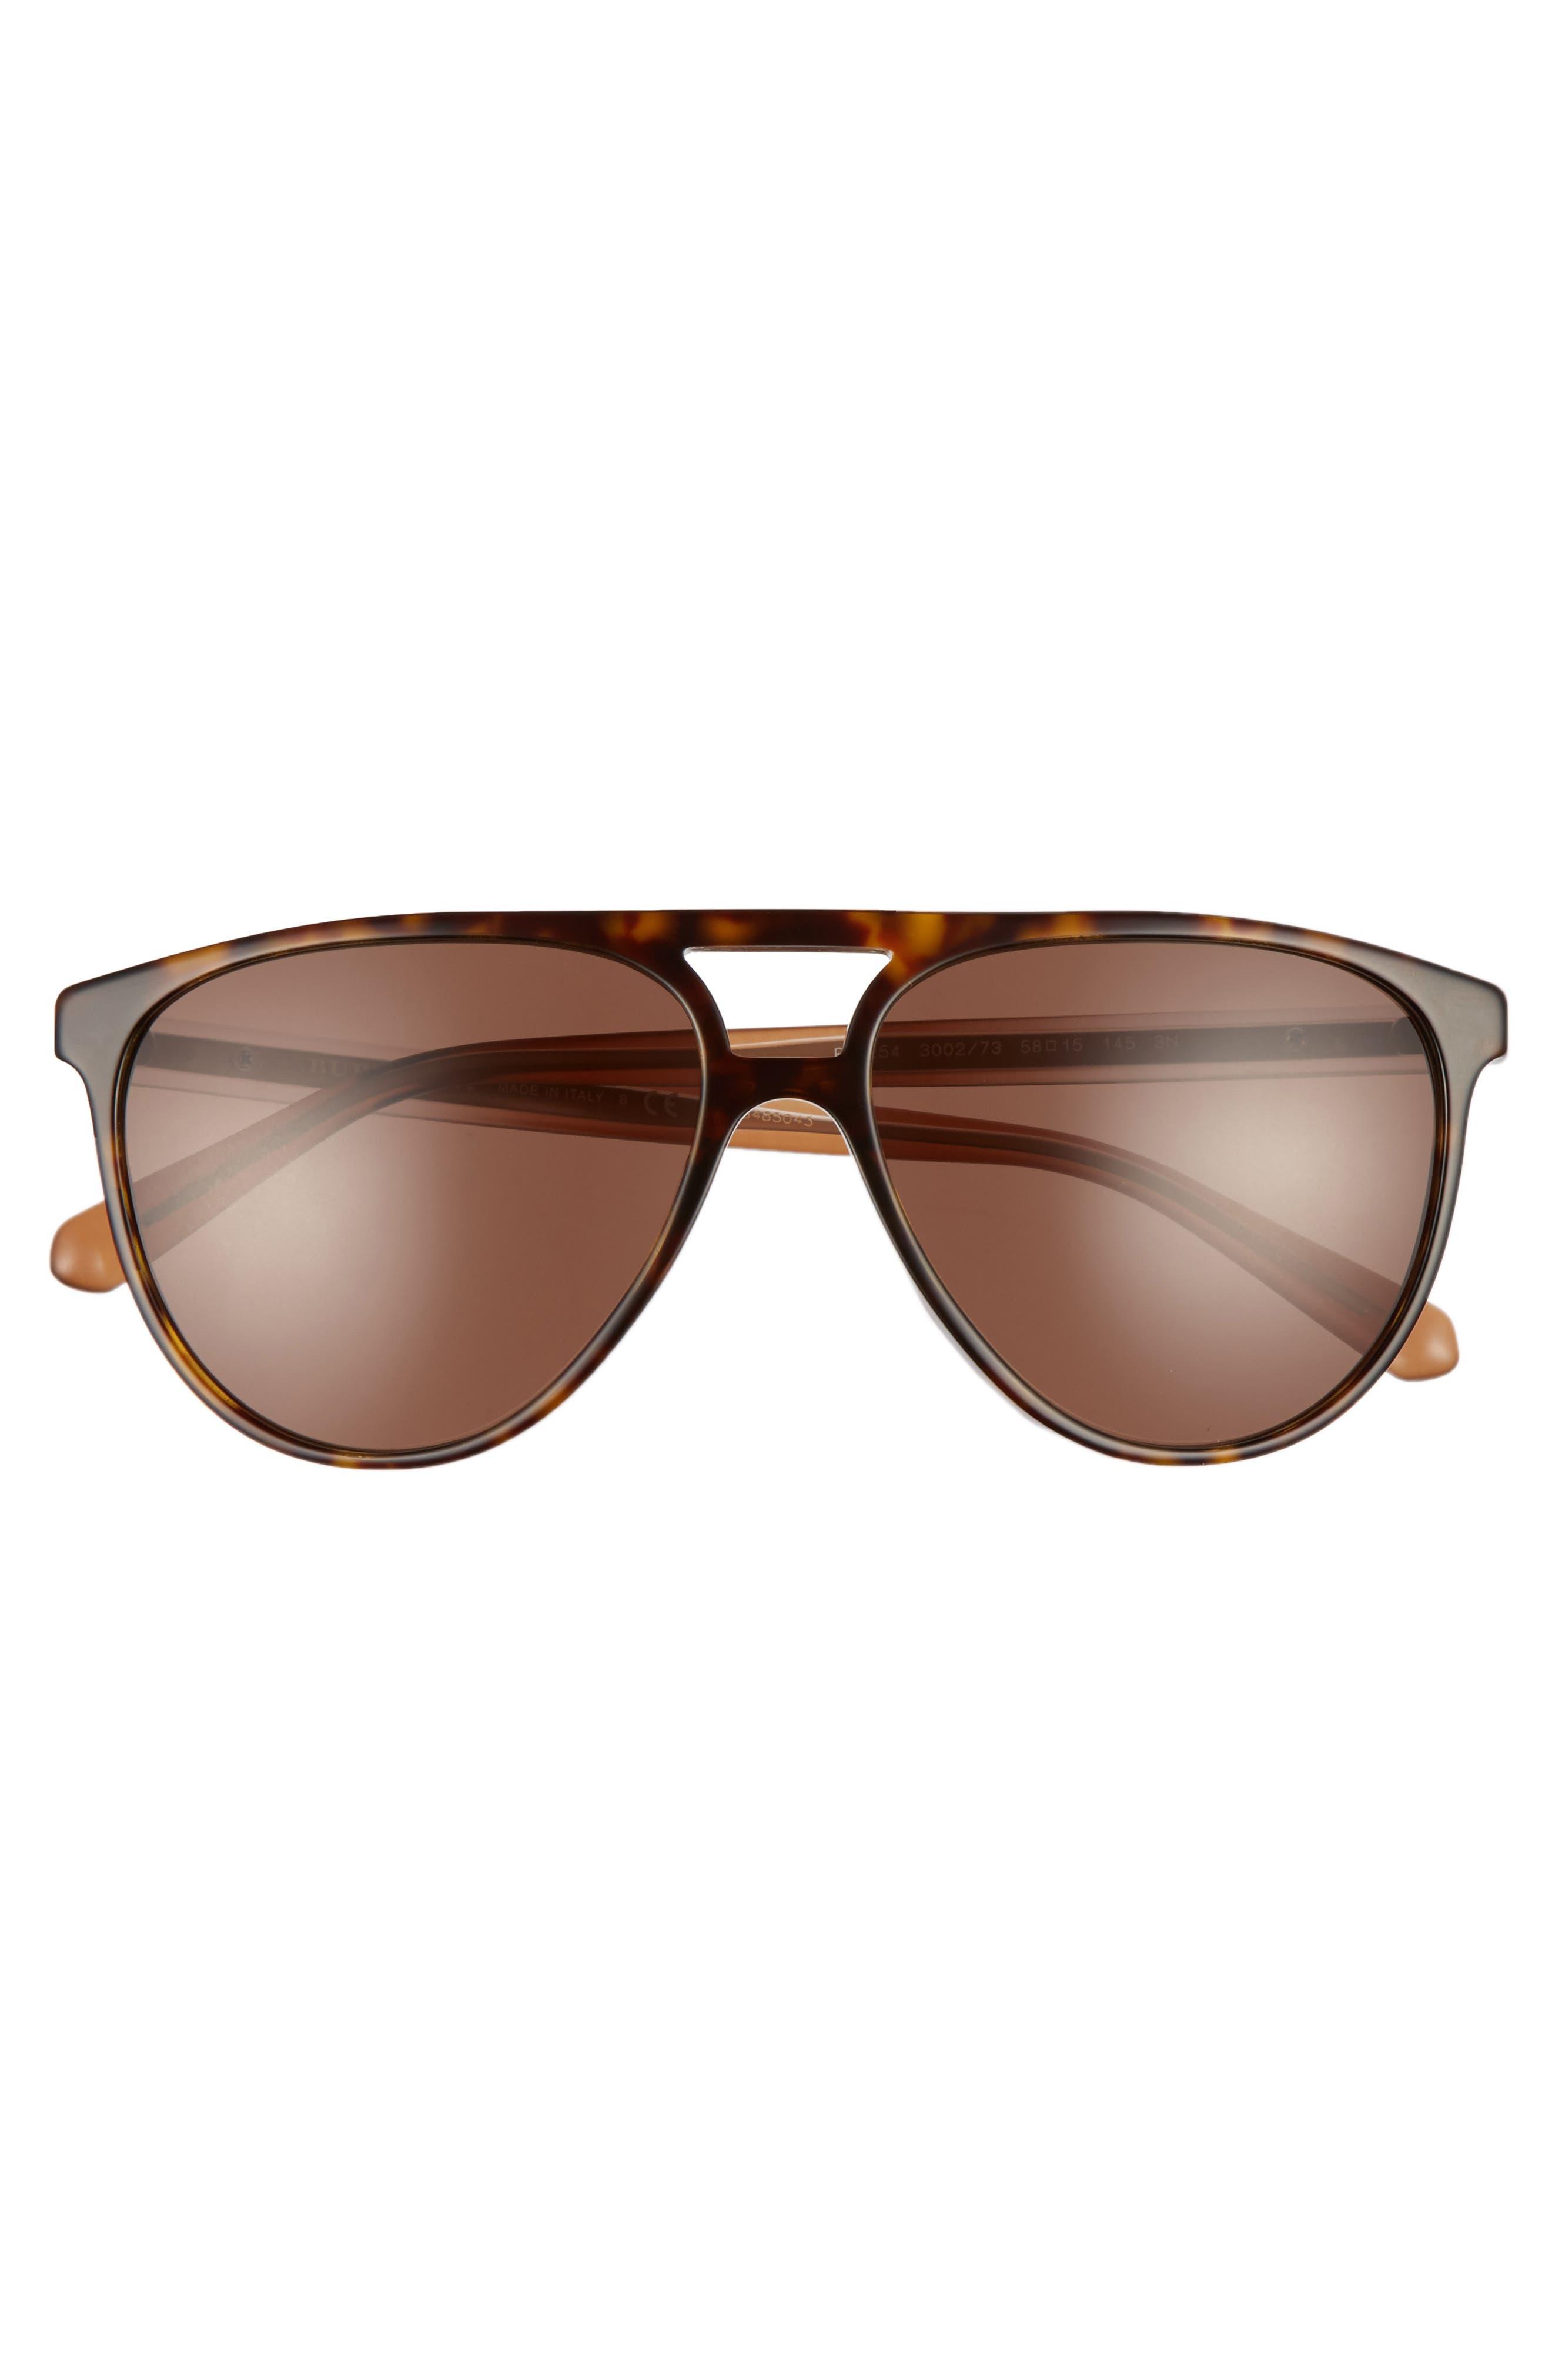 Alternate Image 2  - Burberry 58mm Aviator Sunglasses